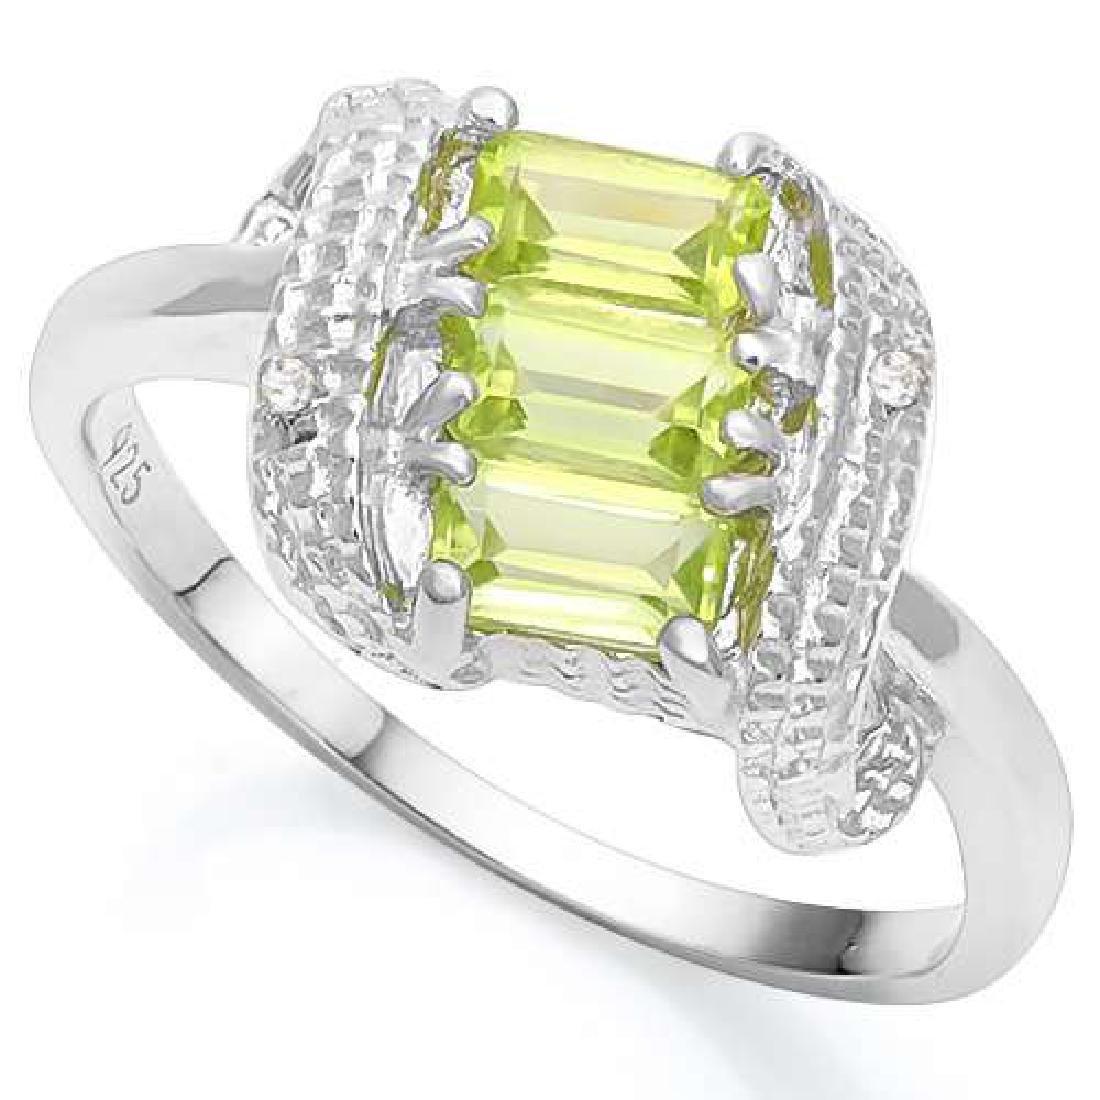 1.00 CTW PERIDOT & DIAMOND 925 STERLING SILVER RING